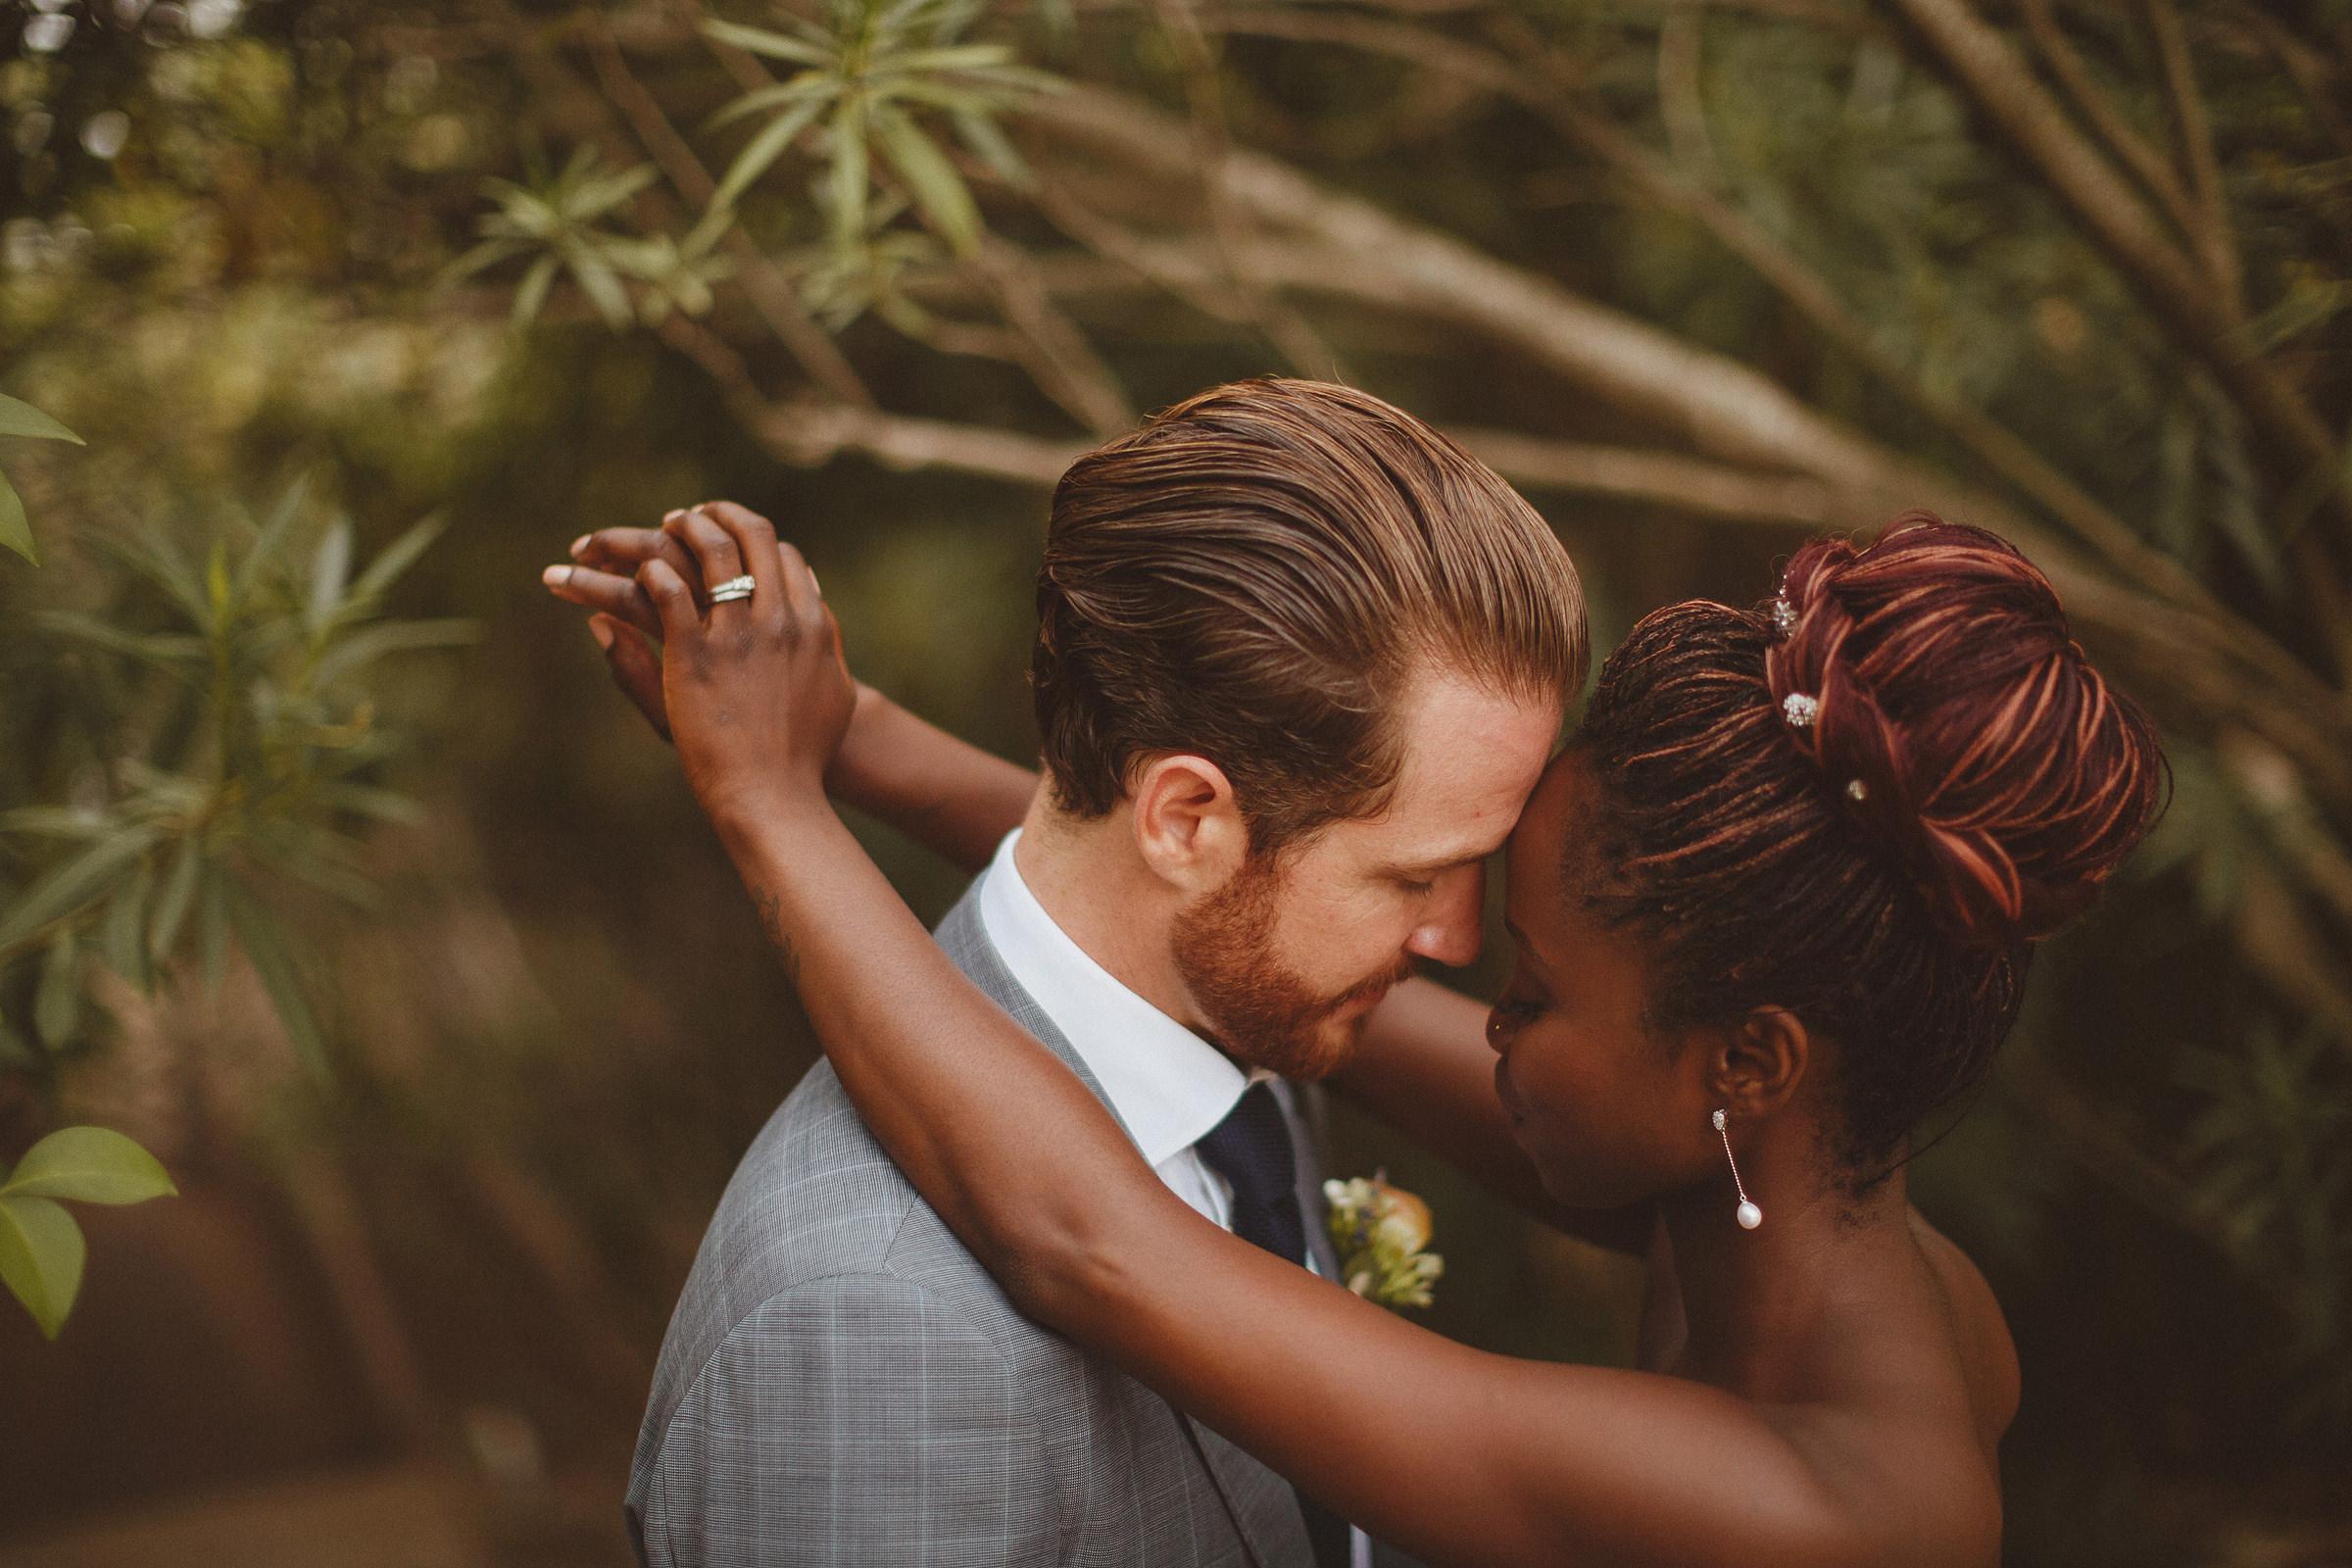 face-to-face-couple-amid-foliage-ed-peers-photography